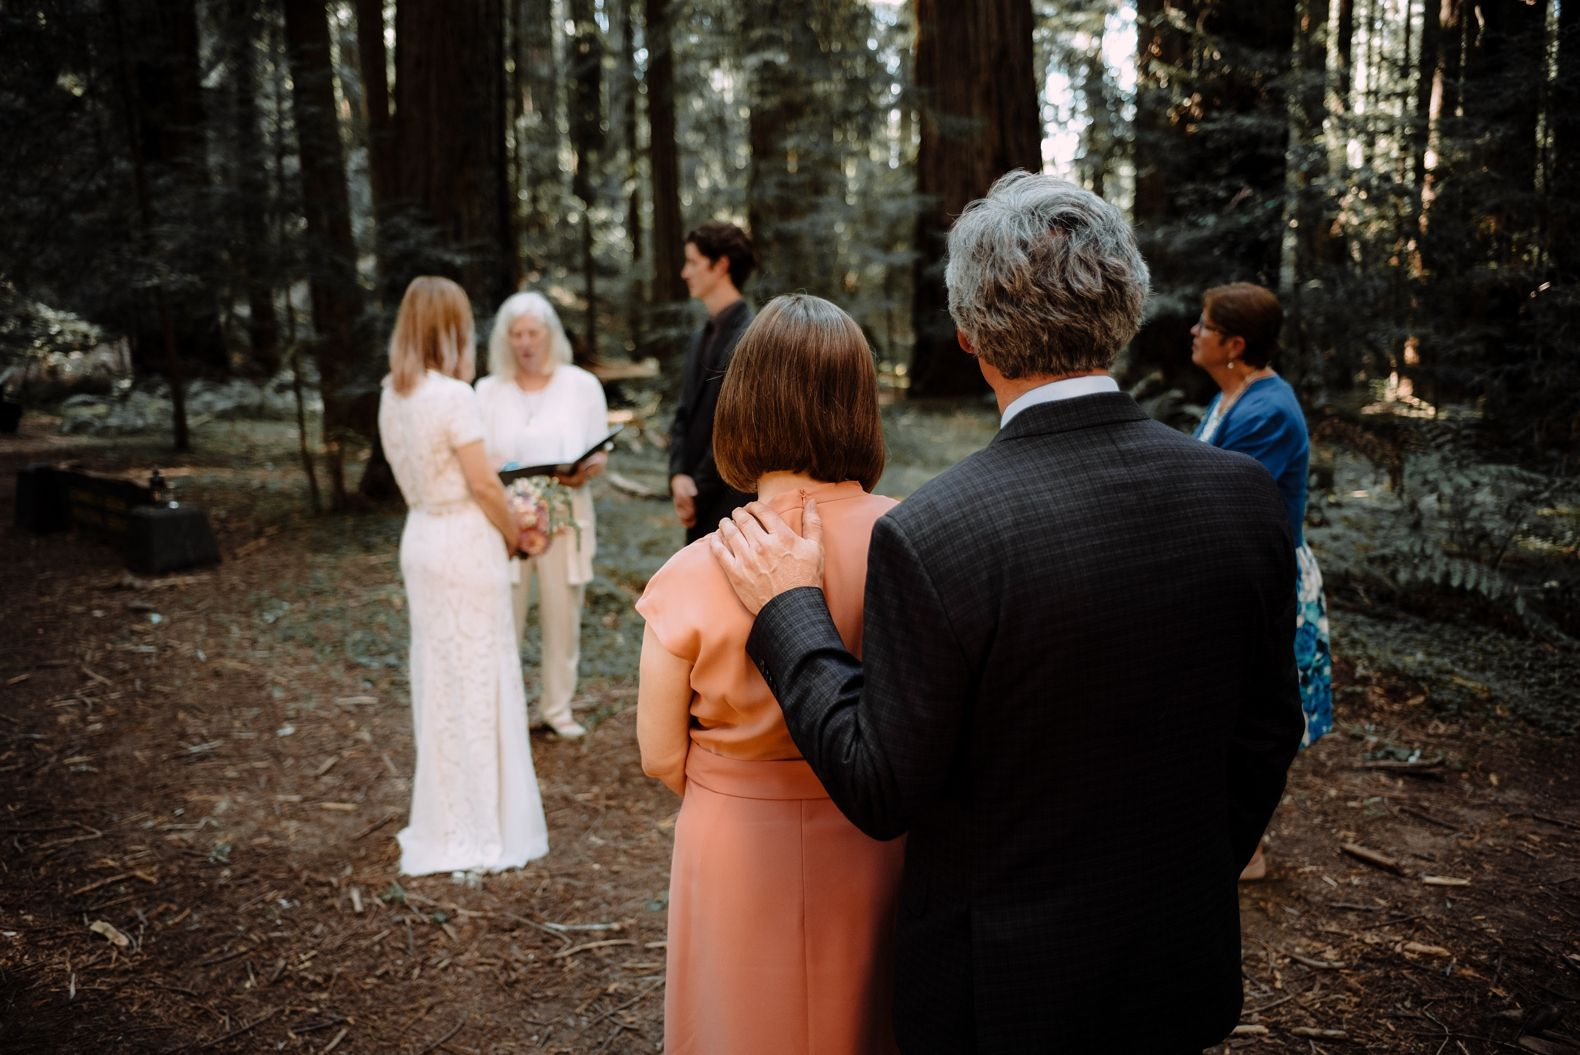 small intimate weddings southern california%0A Redwood Wedding  Small Intimate Wedding  Redwood Forest Elopement  California  Wedding  www